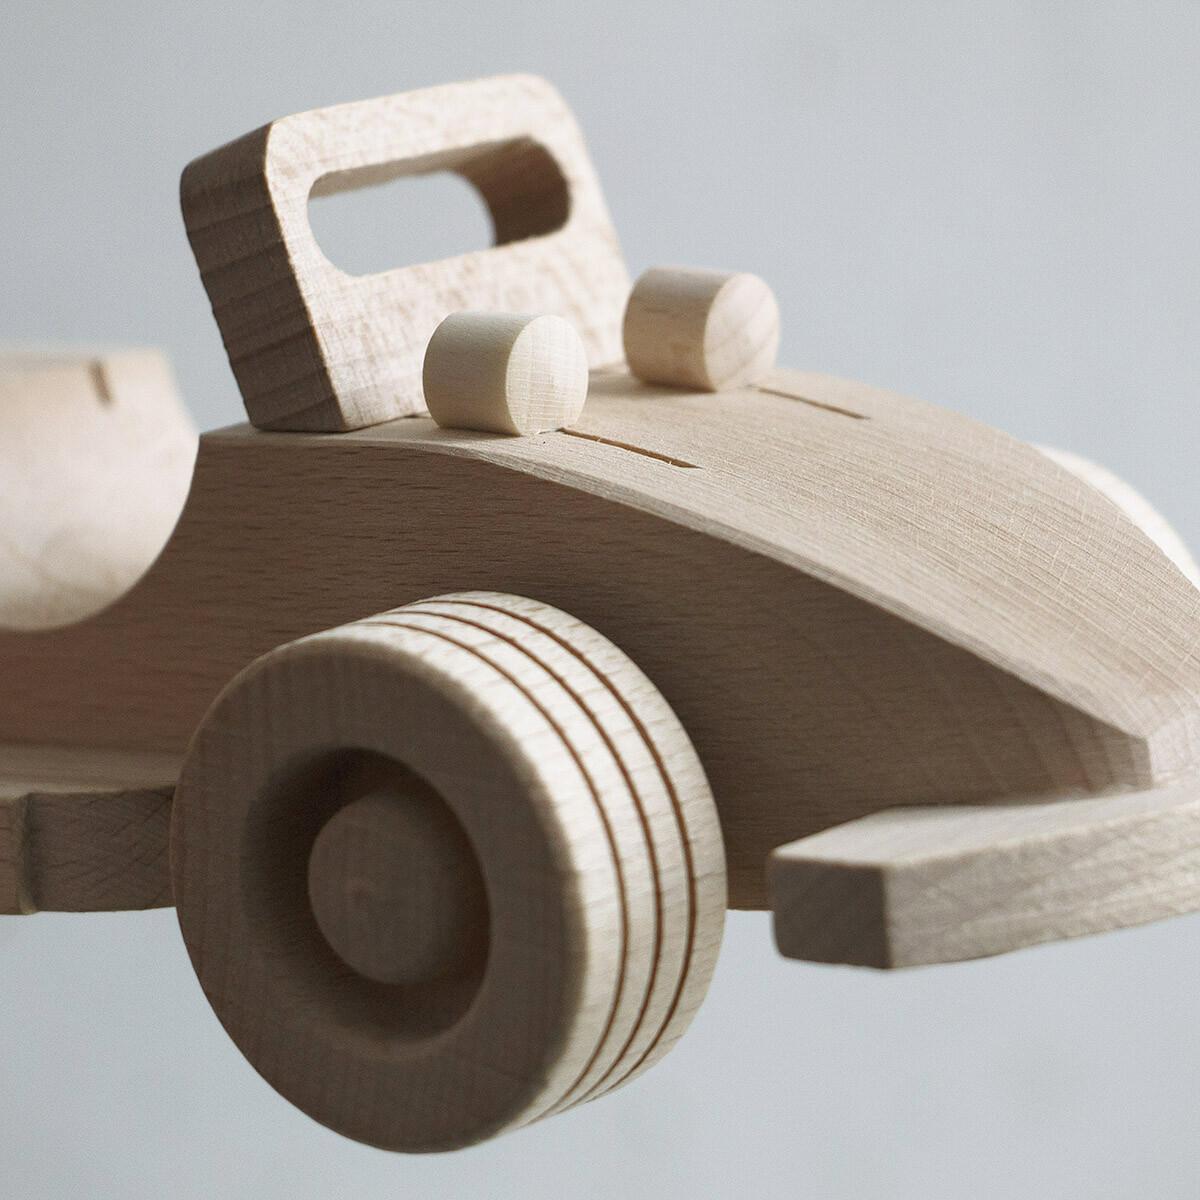 Spielzeug auto holz holzauto holzspielzeug kinderauto pkw